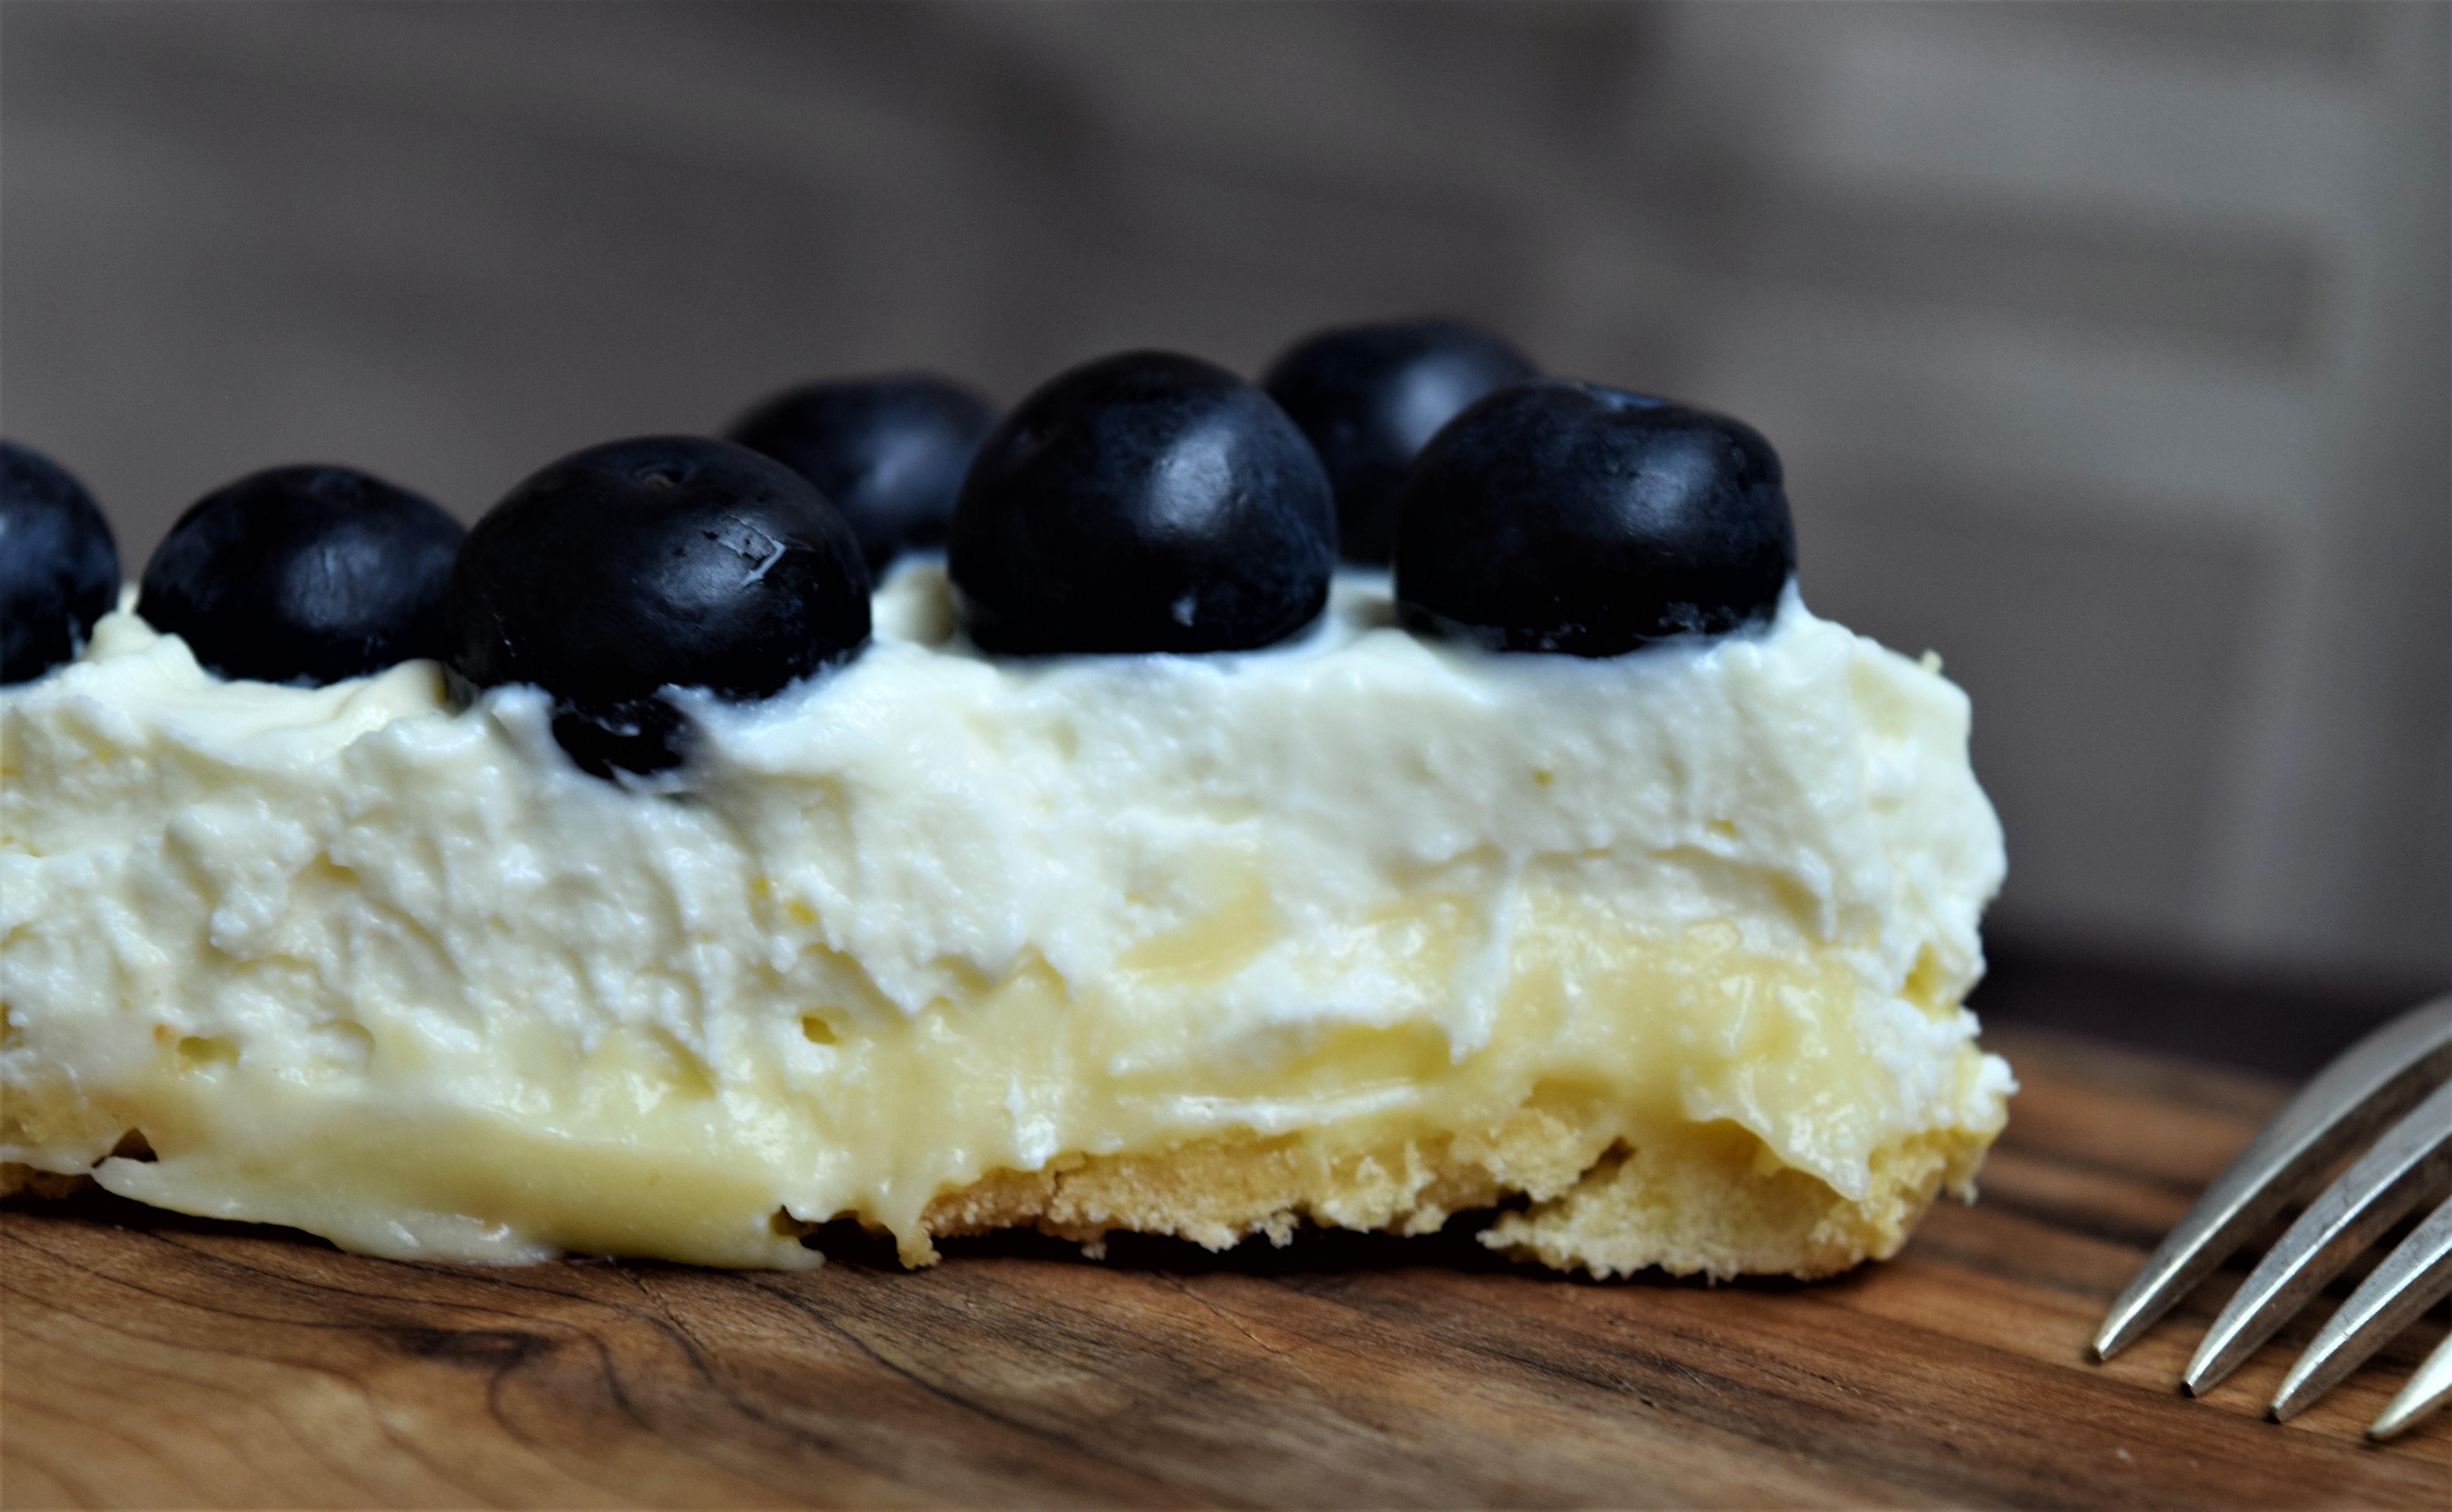 Crostata with Lemon Custard and Whipped Ricotta Cream